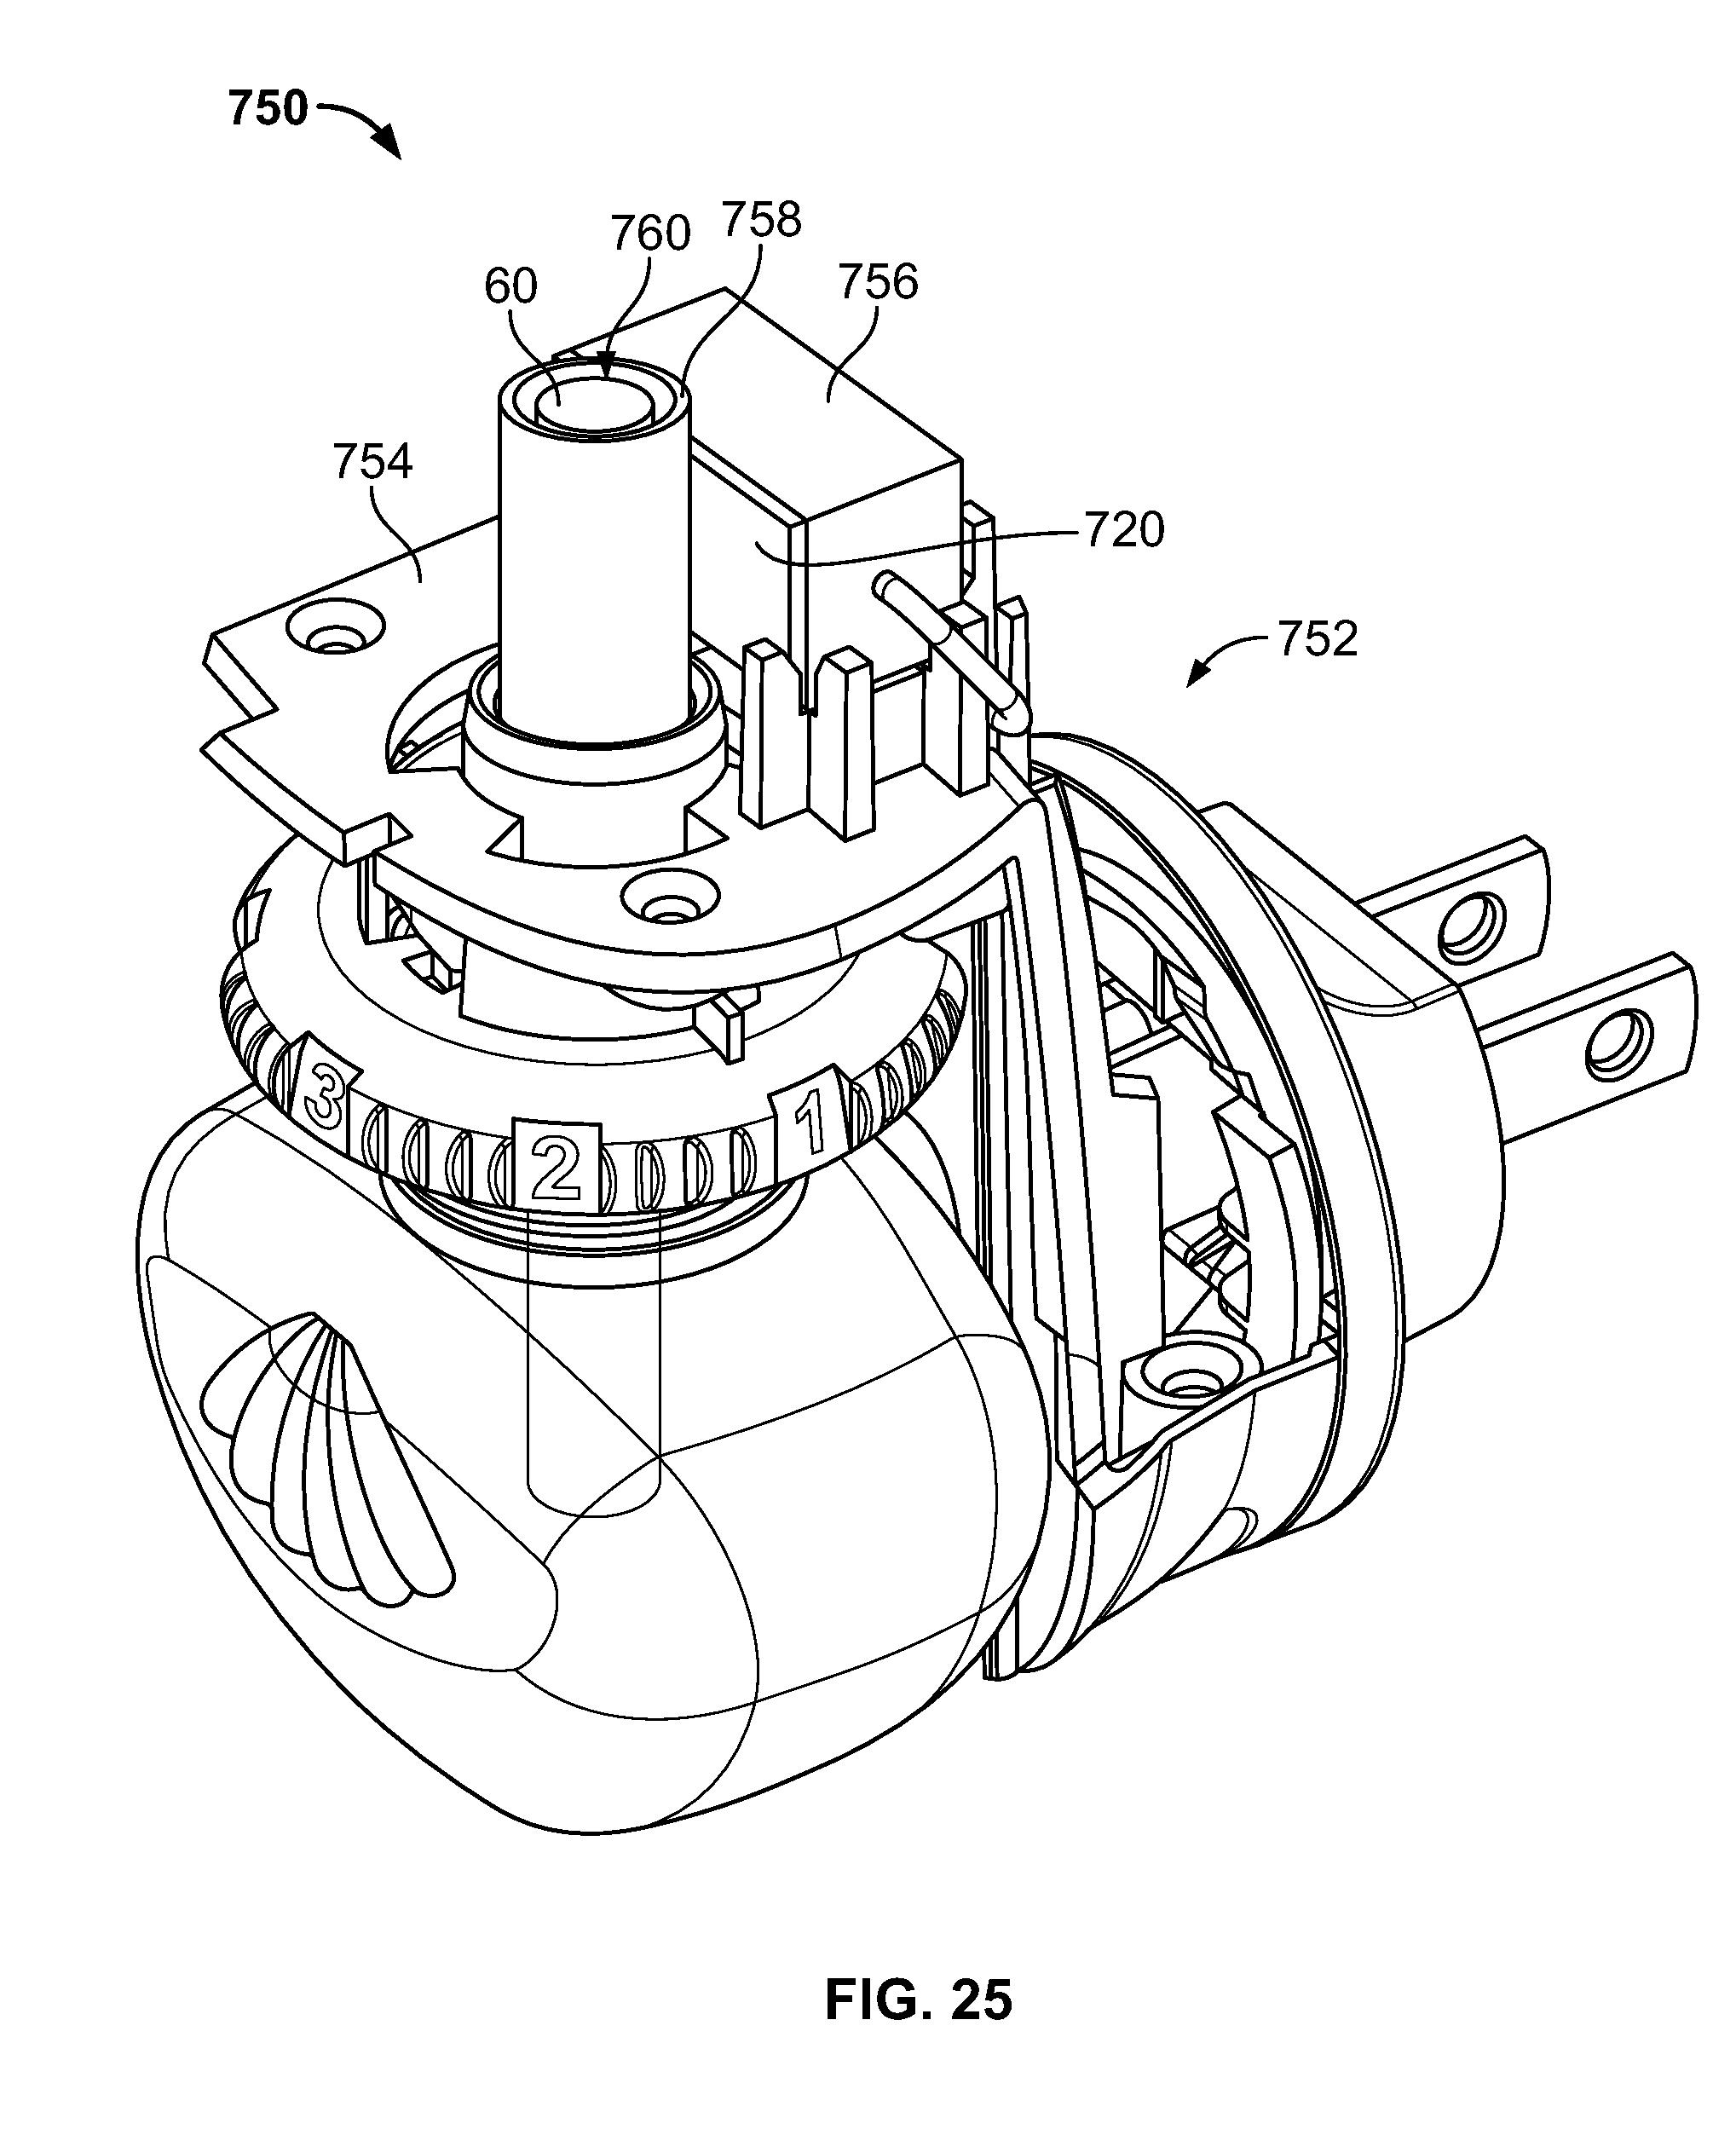 US20140037273A1 20140206 D00025 jayco 6 pin wiring diagram wiring,Wiring A Minn Kota Trolling Motor Plug